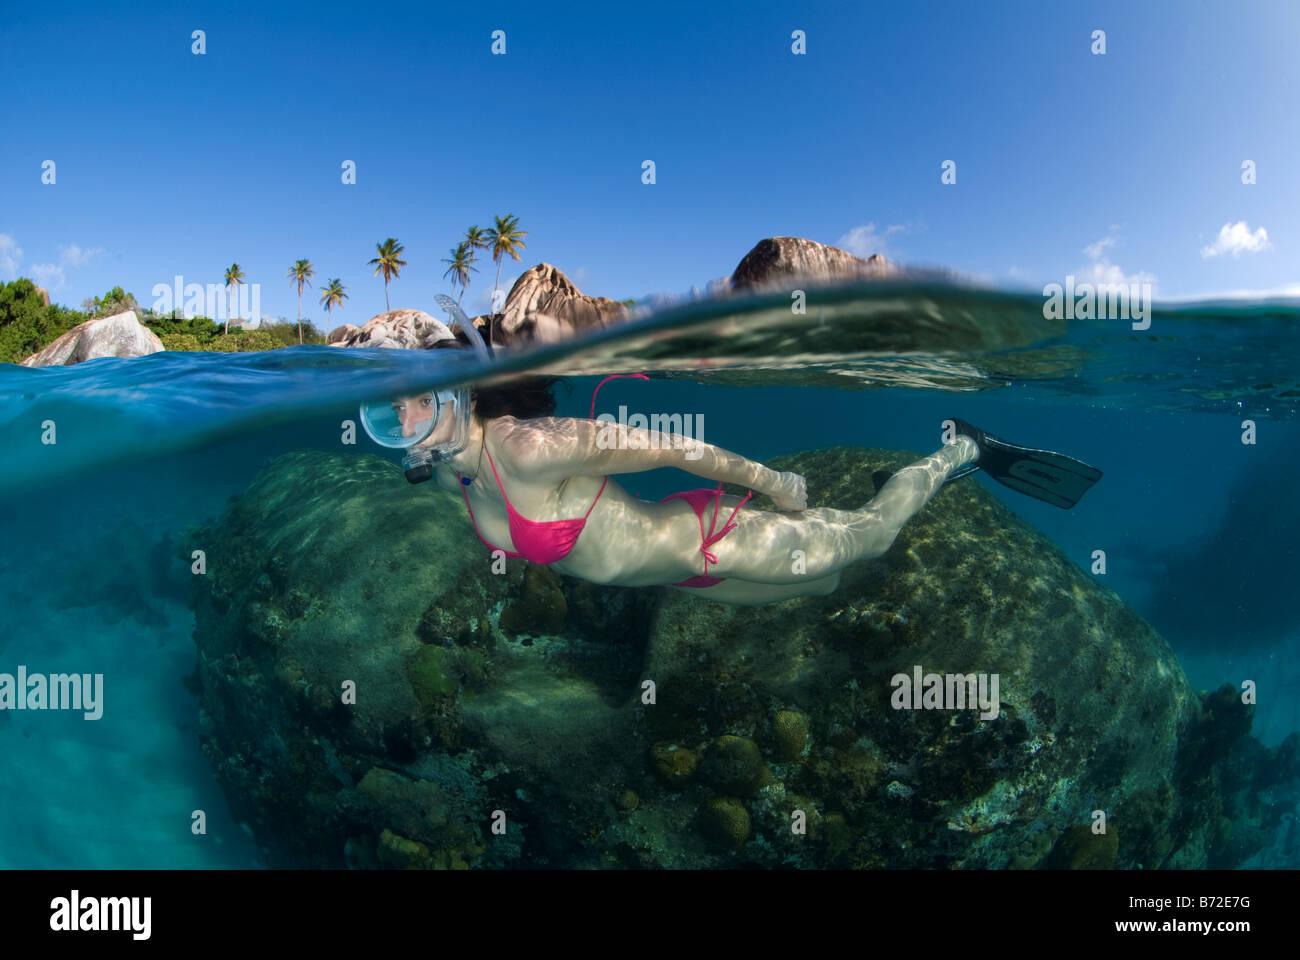 Snorkeling in Baths beach, British Virgin Islands, female diver, oval mask, bikini, blue water, clear water, snorkel, - Stock Image